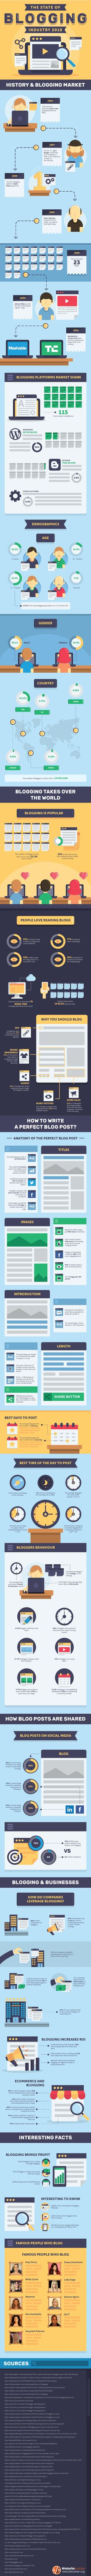 704 best Online Marketing images on Pinterest   Internet marketing ...